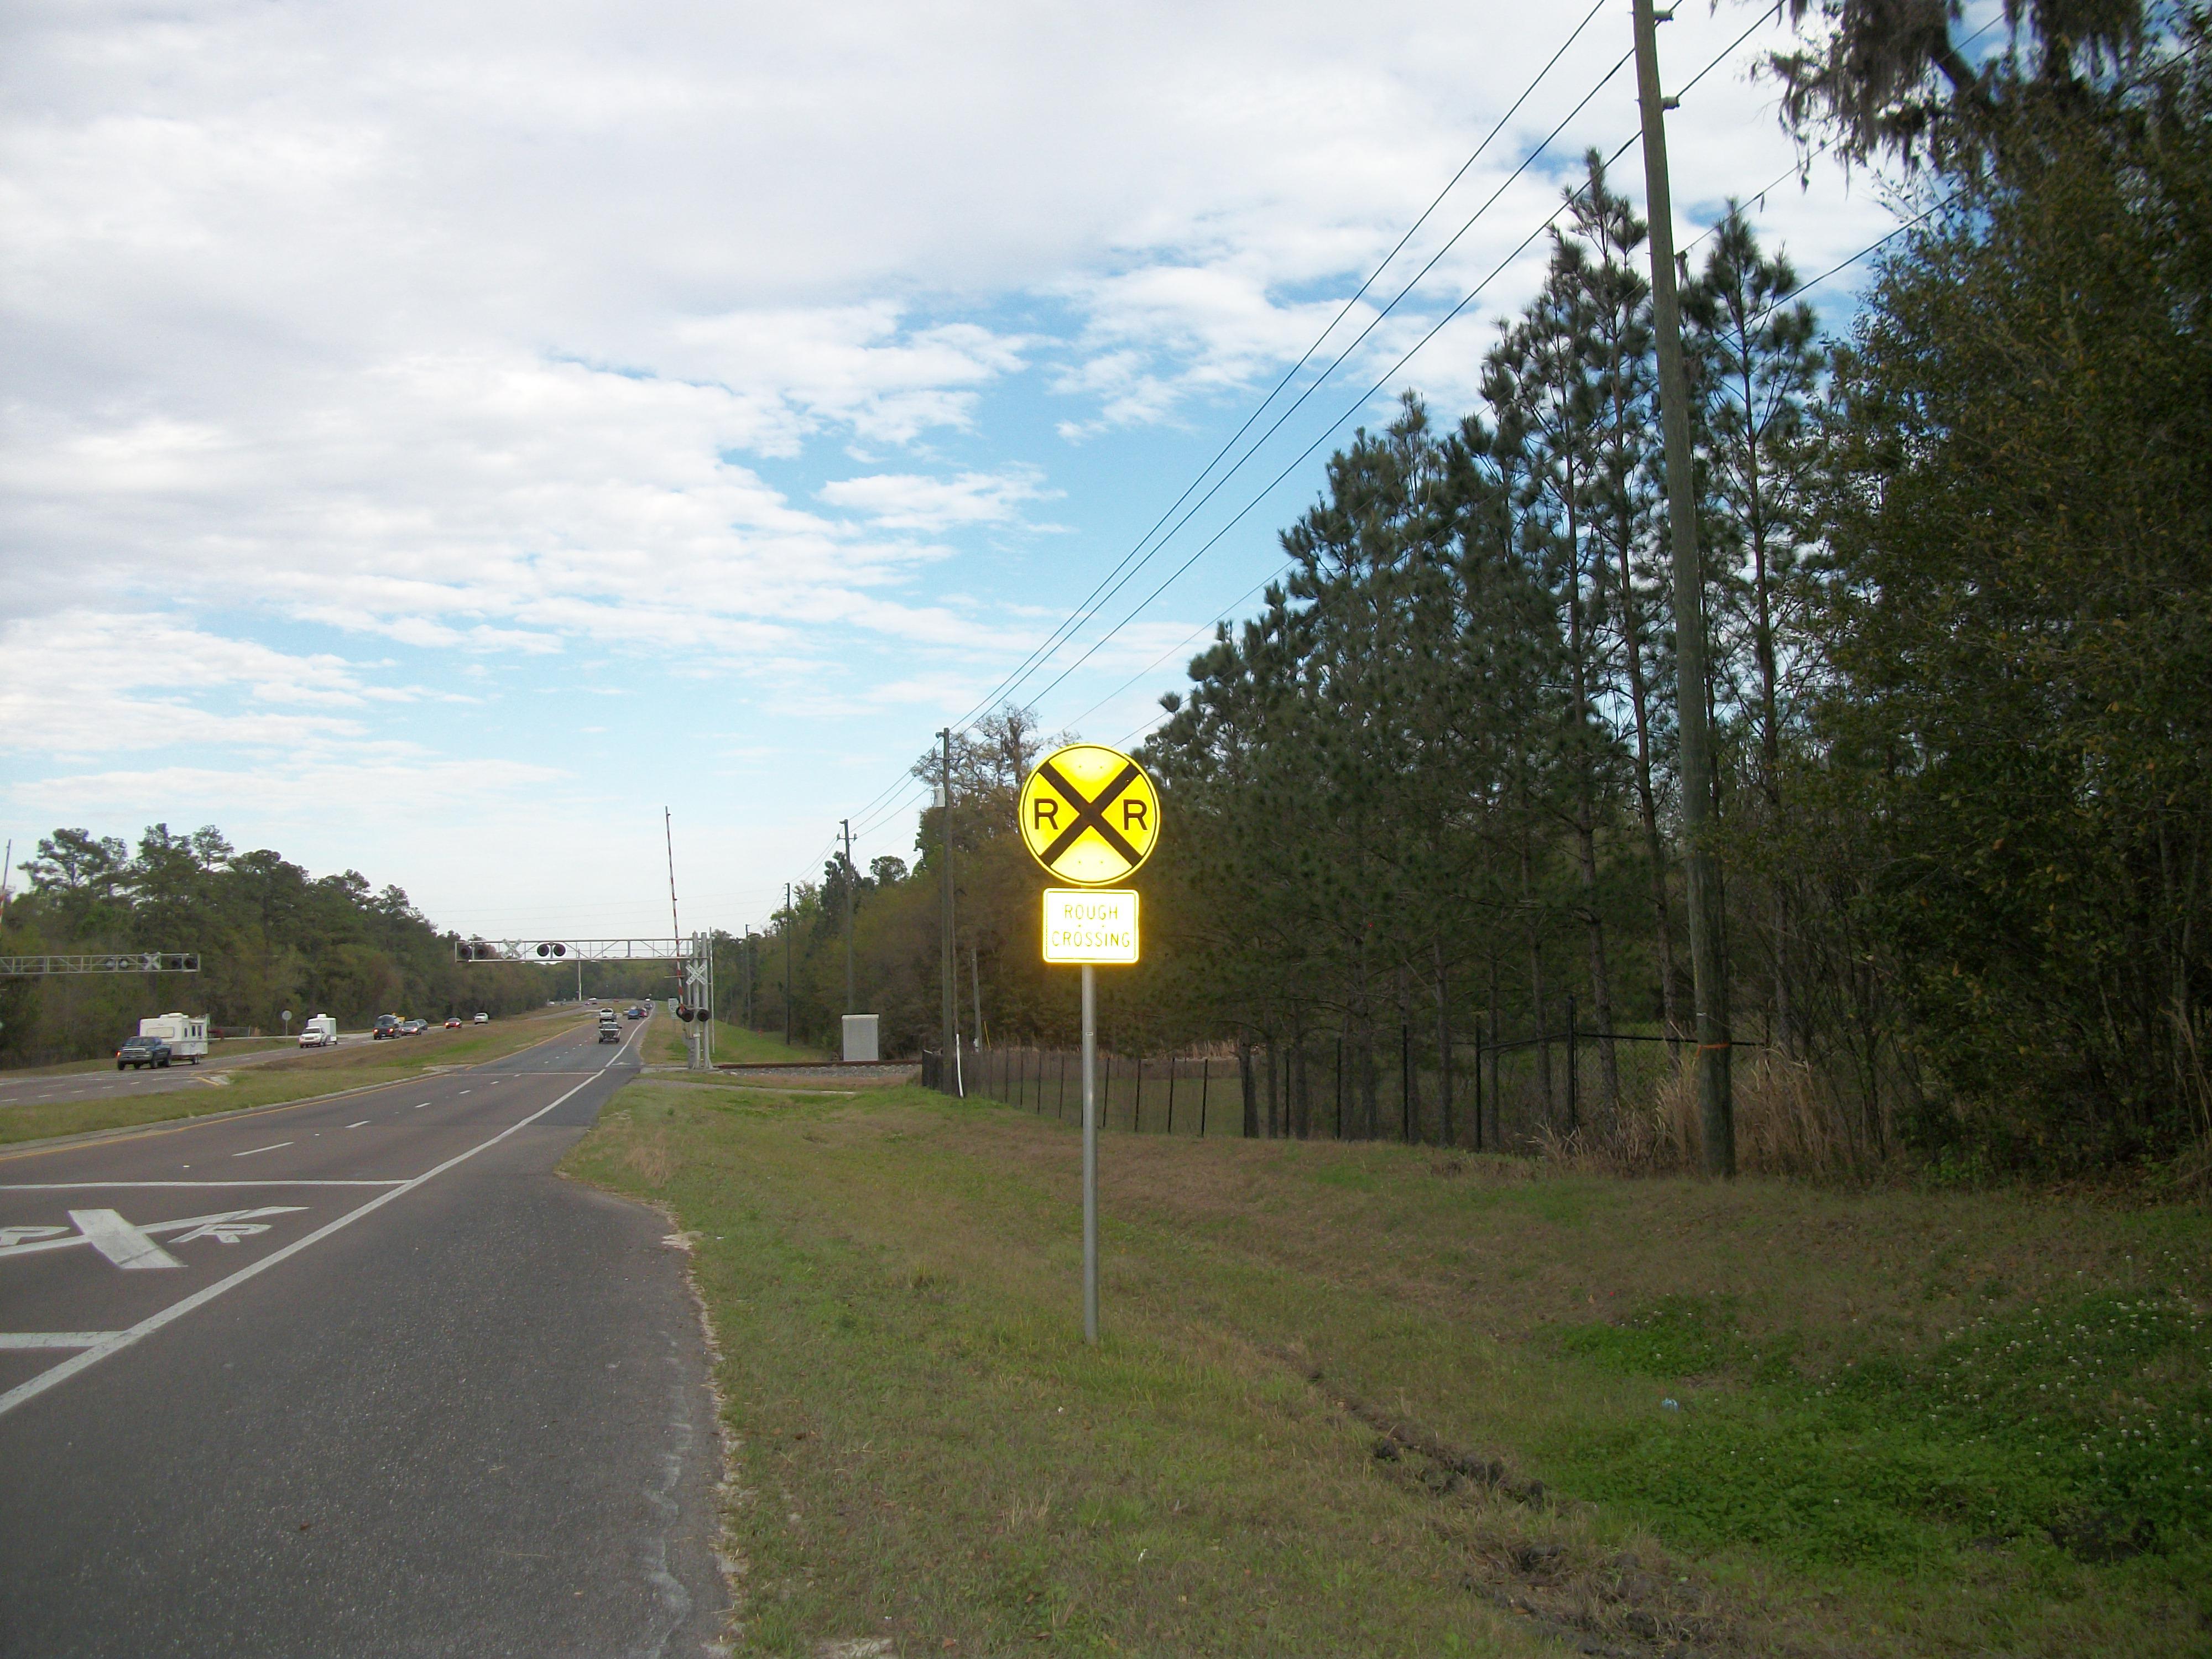 File:EB FL 50 Rough RxR Crossing; Brooksville.JPG ...